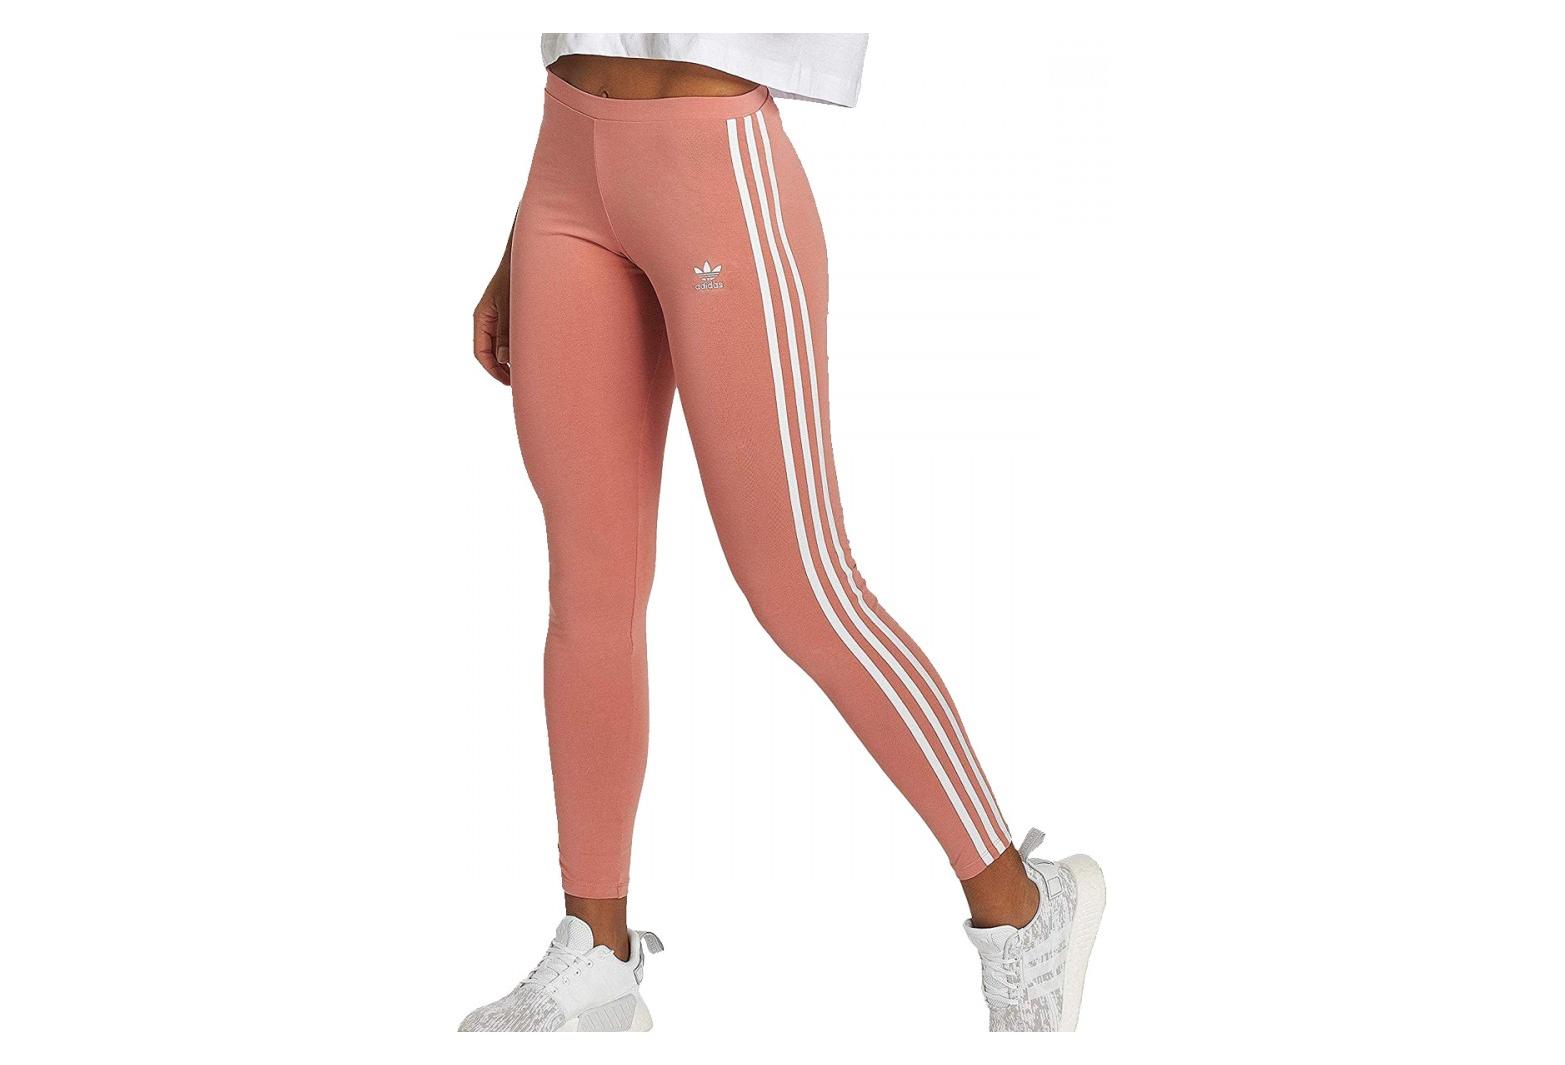 Legging rose femme Adidas 3 stripes